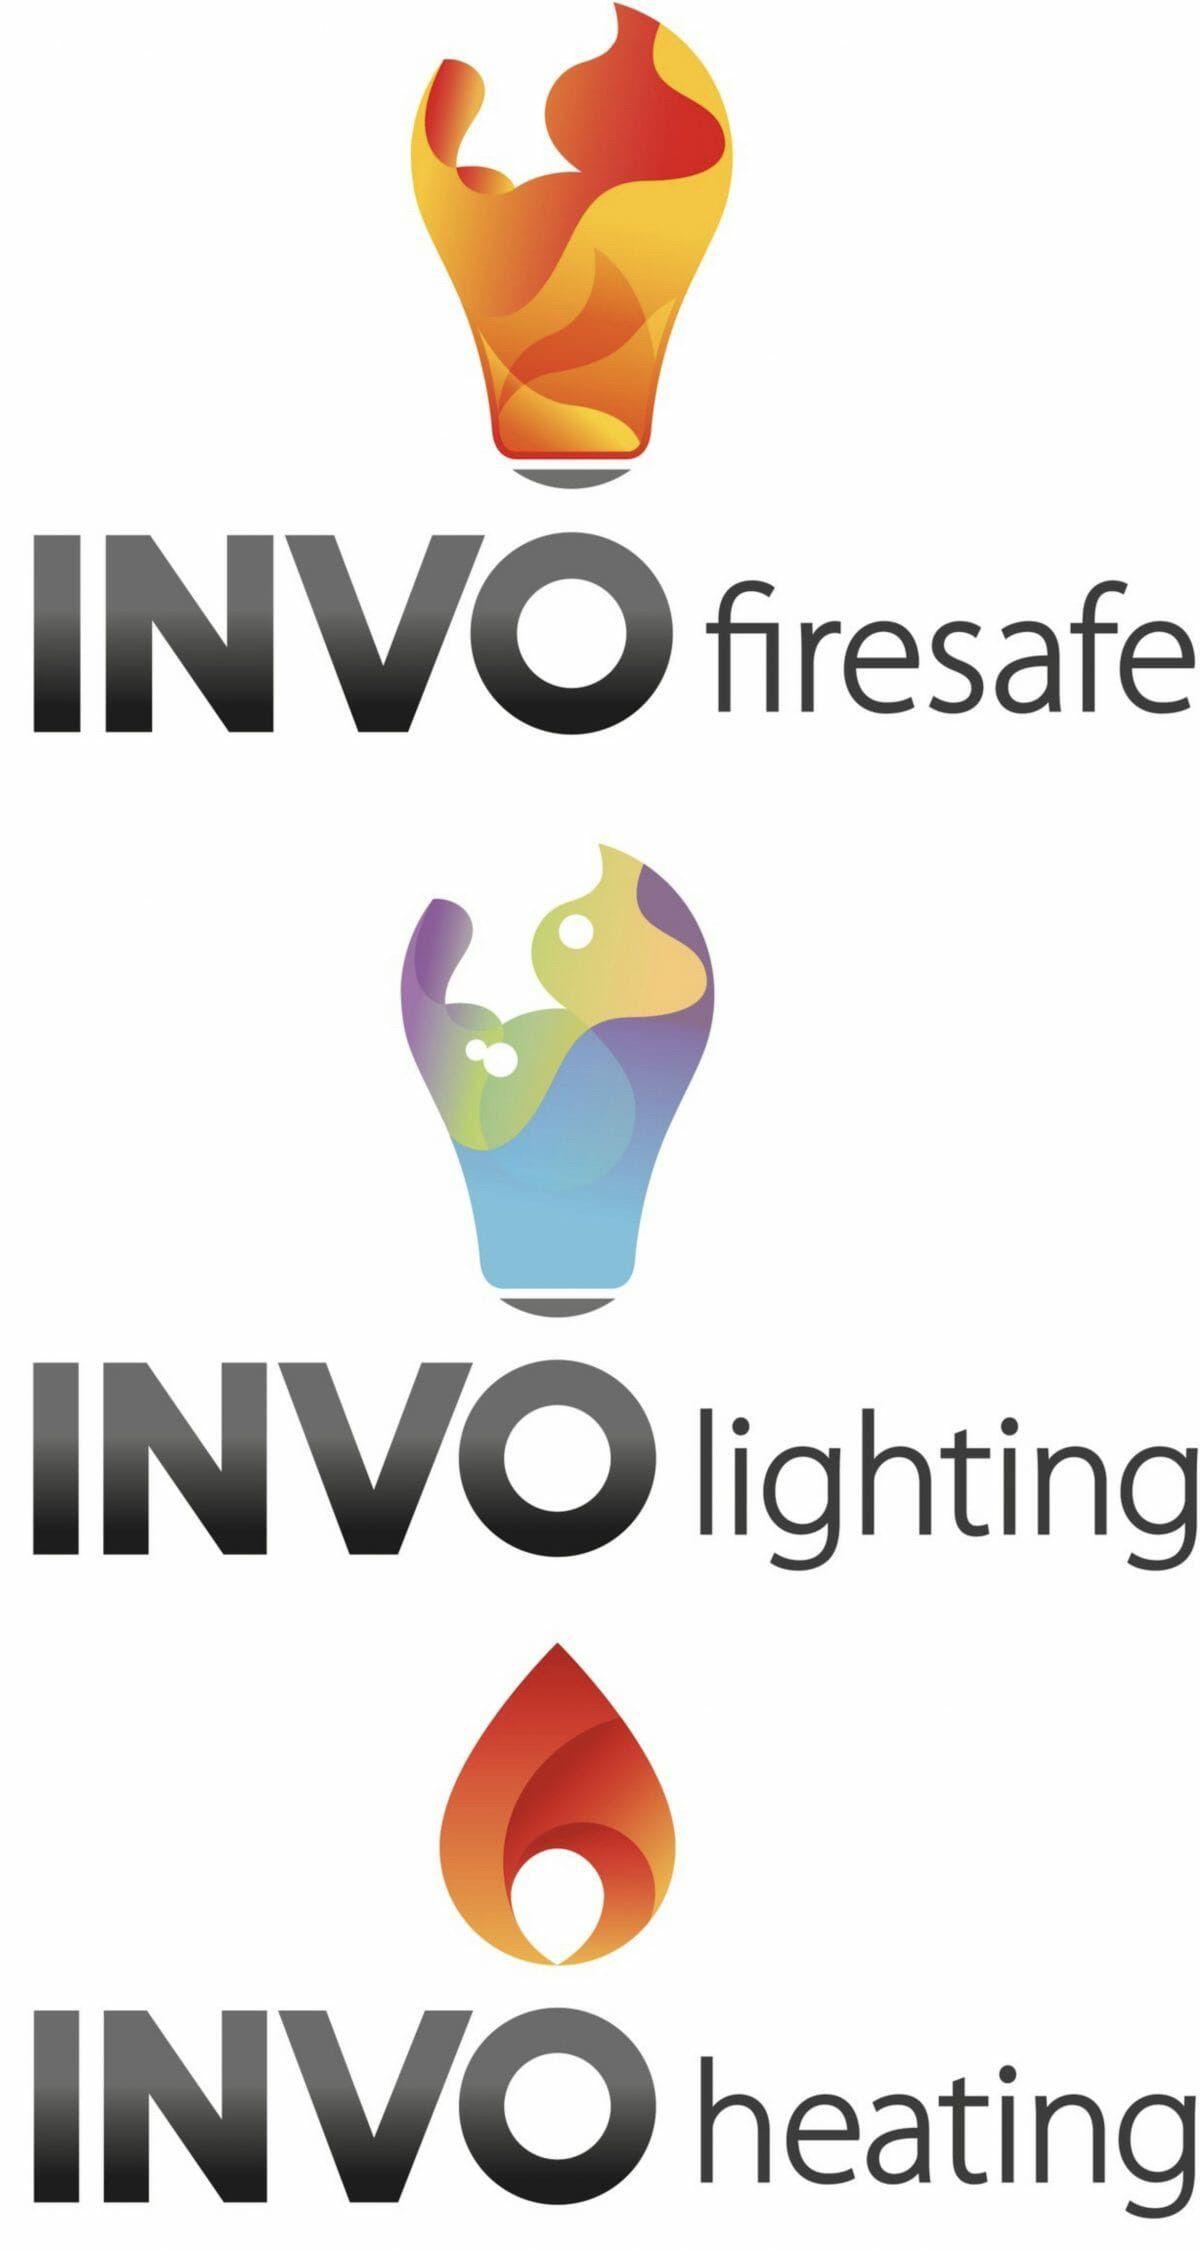 heating-and-lighting-logos-1200x2252.jpg